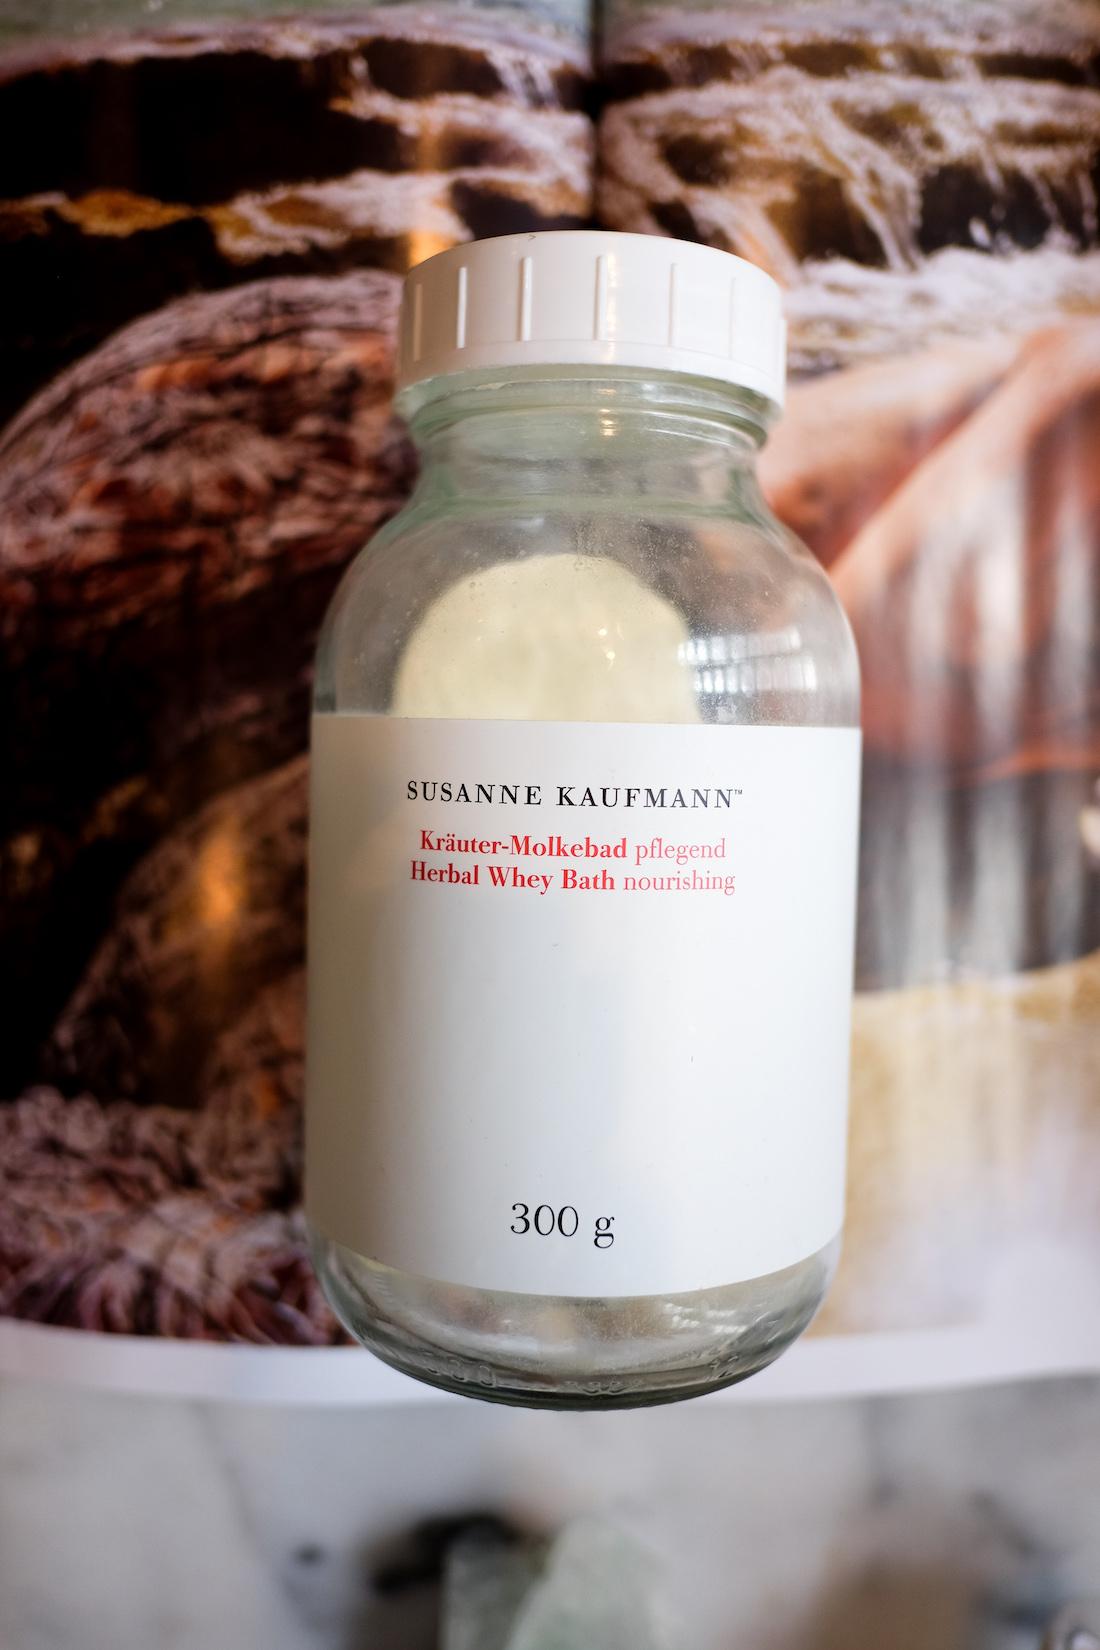 Susanne Kaufmann's Herbal Whey Bath - The Stripe